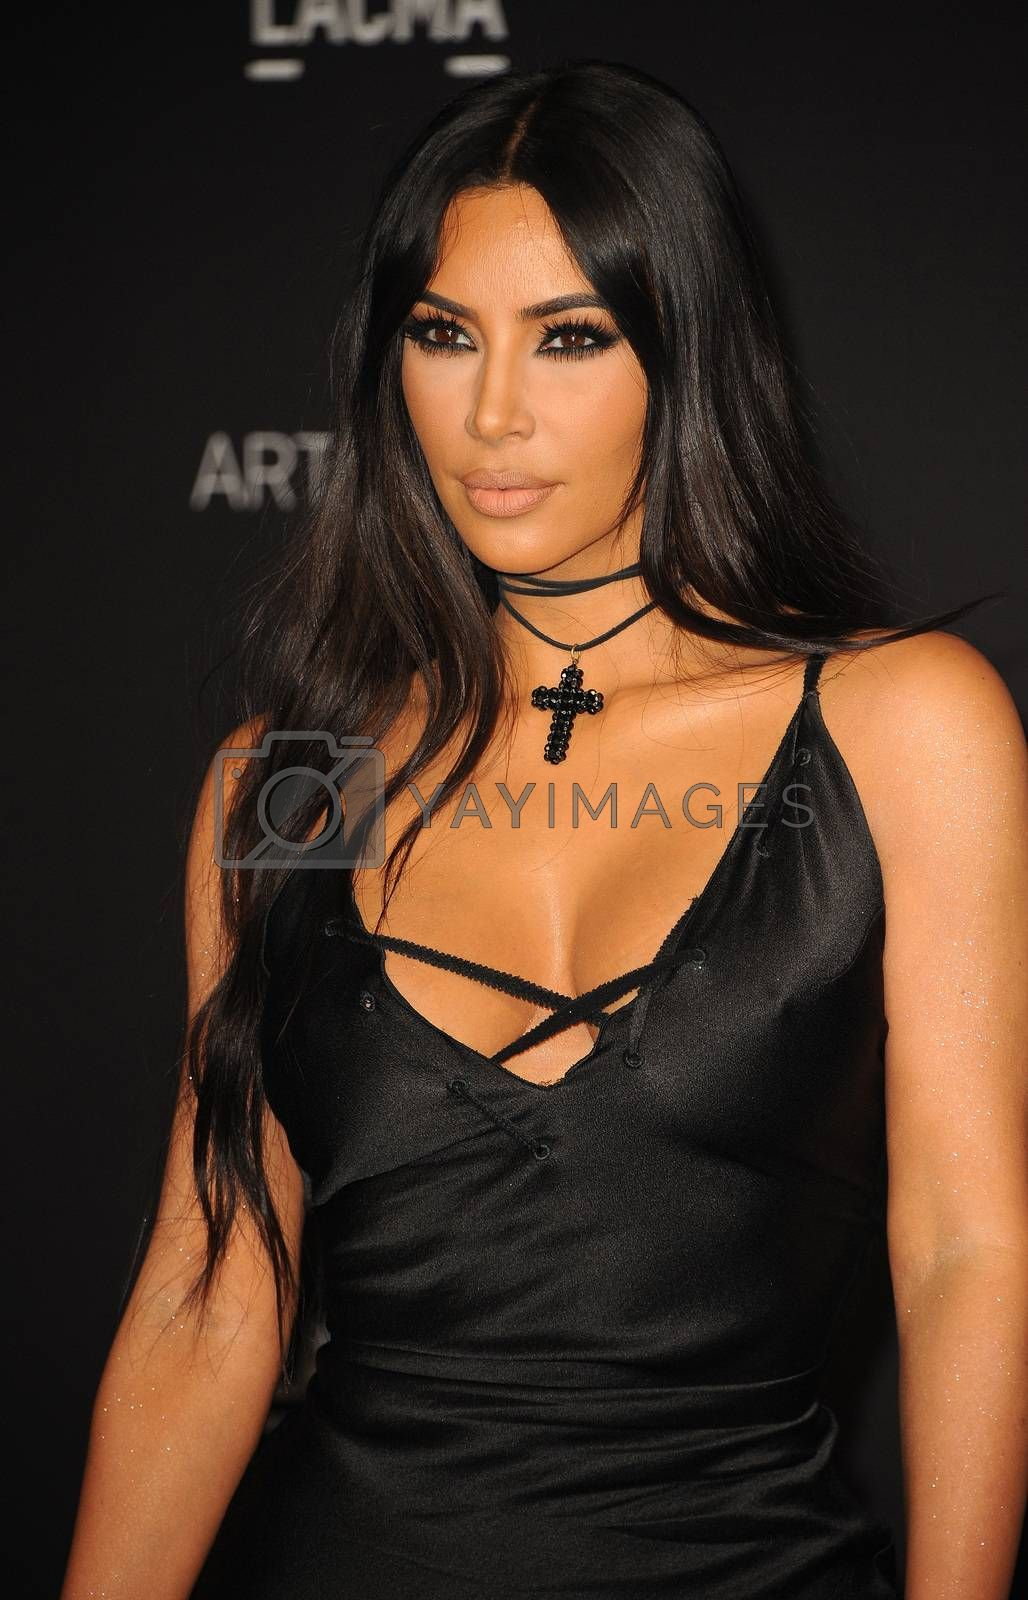 Kim Kardashian at the 2018 LACMA Art + Film Gala held at the LACMA in Los Angeles, USA on November 3, 2018.